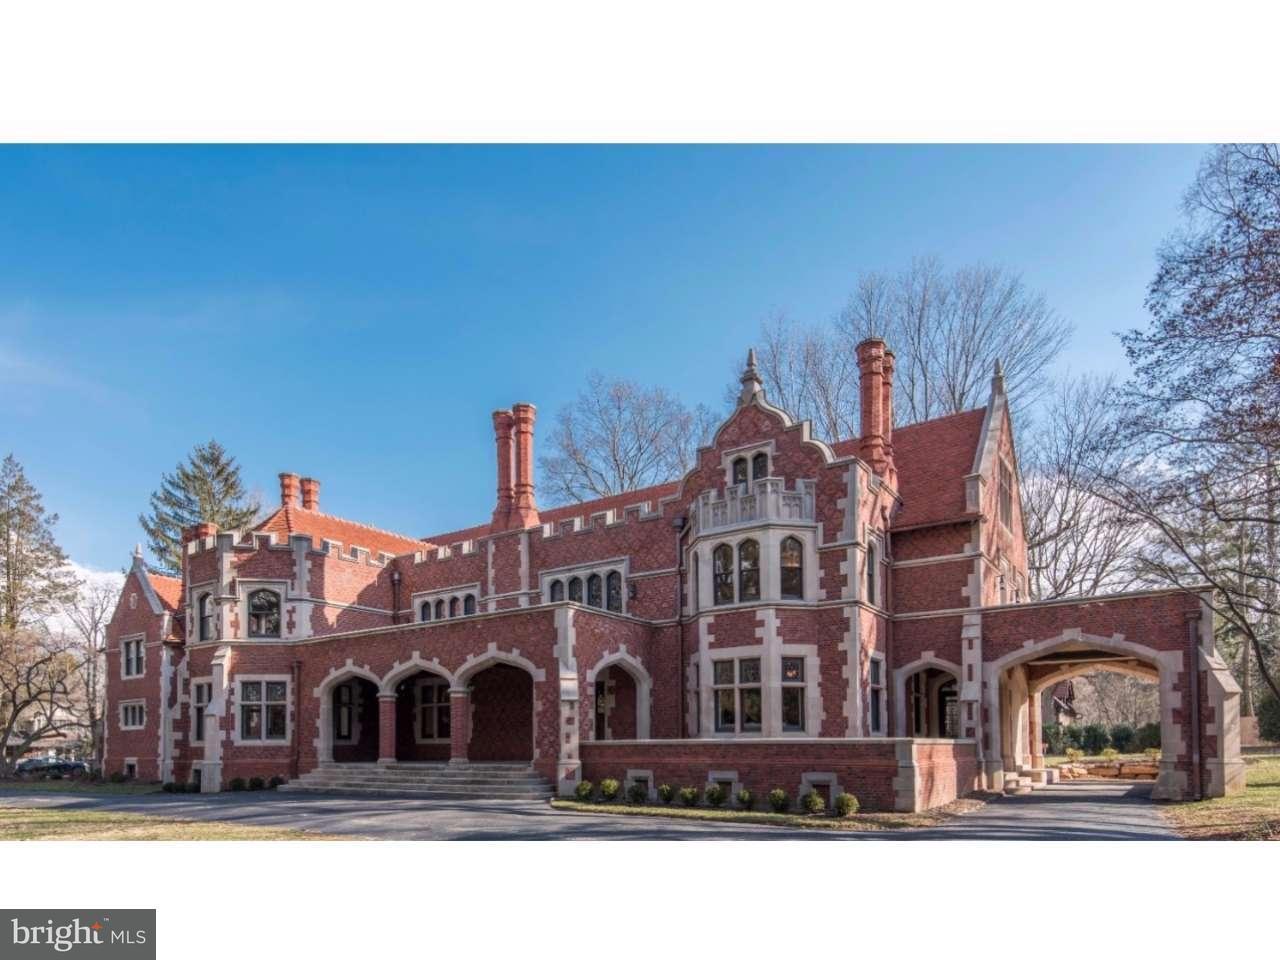 Single Family Home for Sale at 100 PEMBROKE Avenue Wayne, Pennsylvania 19087 United States